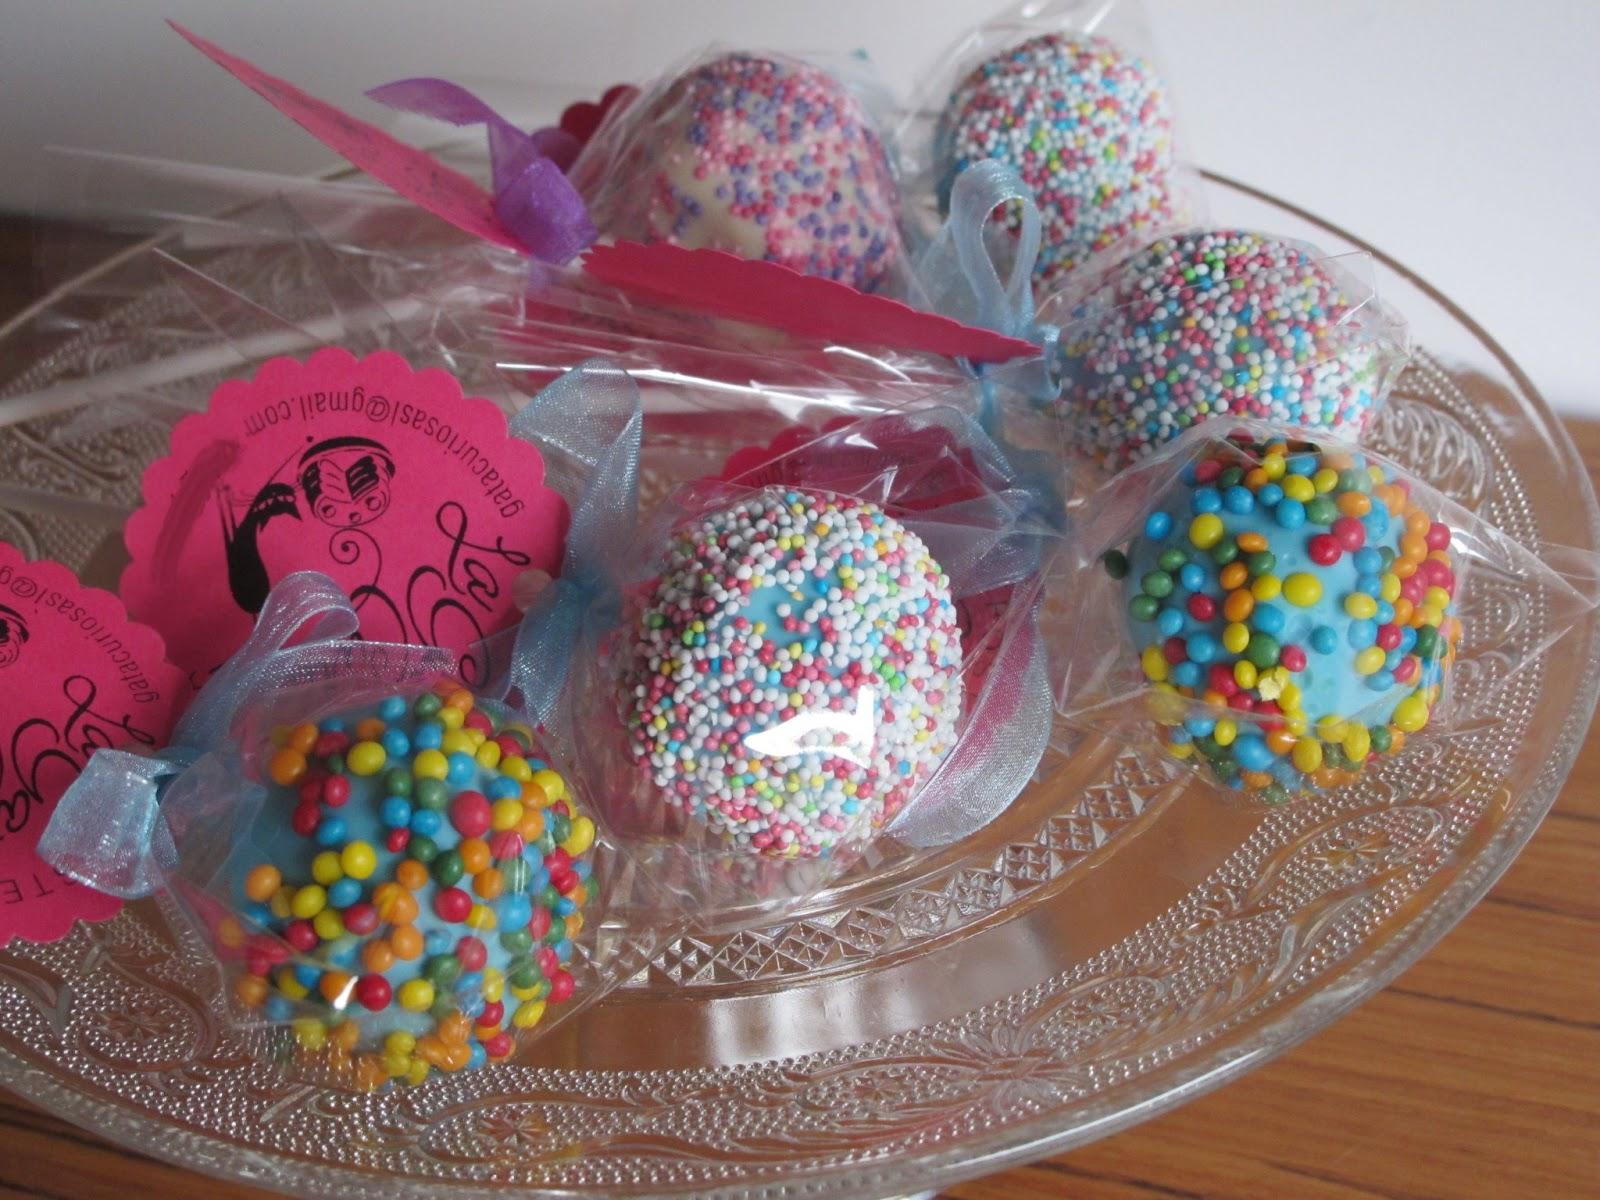 La gata curiosa cake pops de chocolate y naranja for Cake pops cobertura